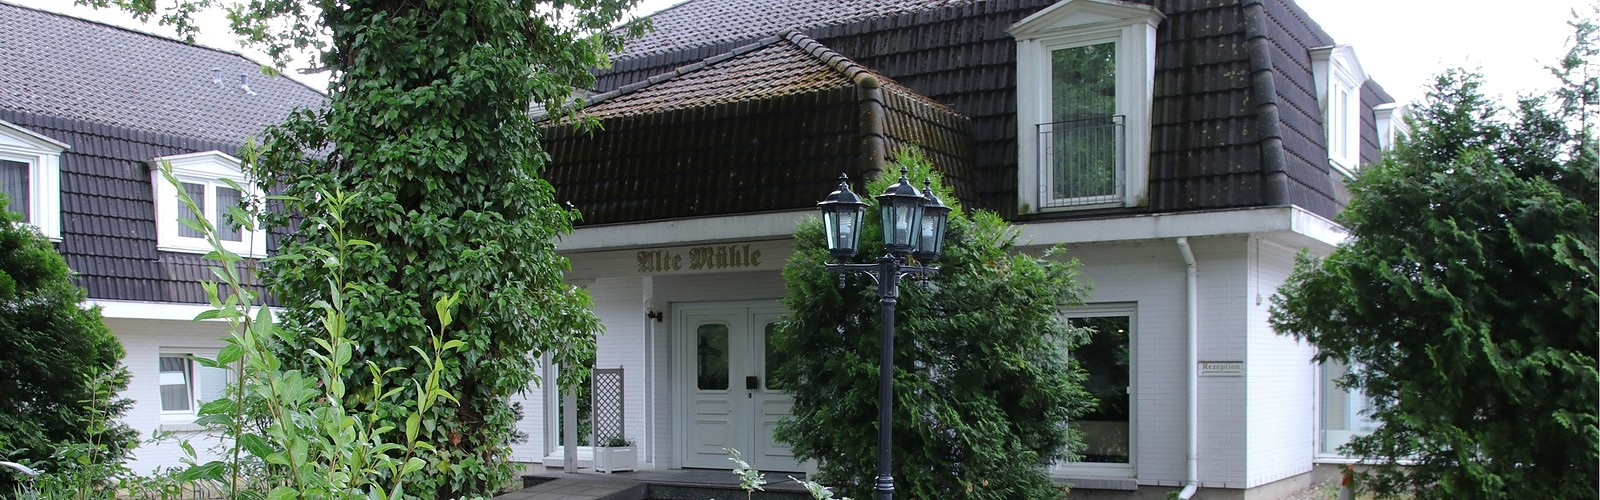 Hotel Alte Mühle, outdoor area, photo: Hotel Alte Mühle